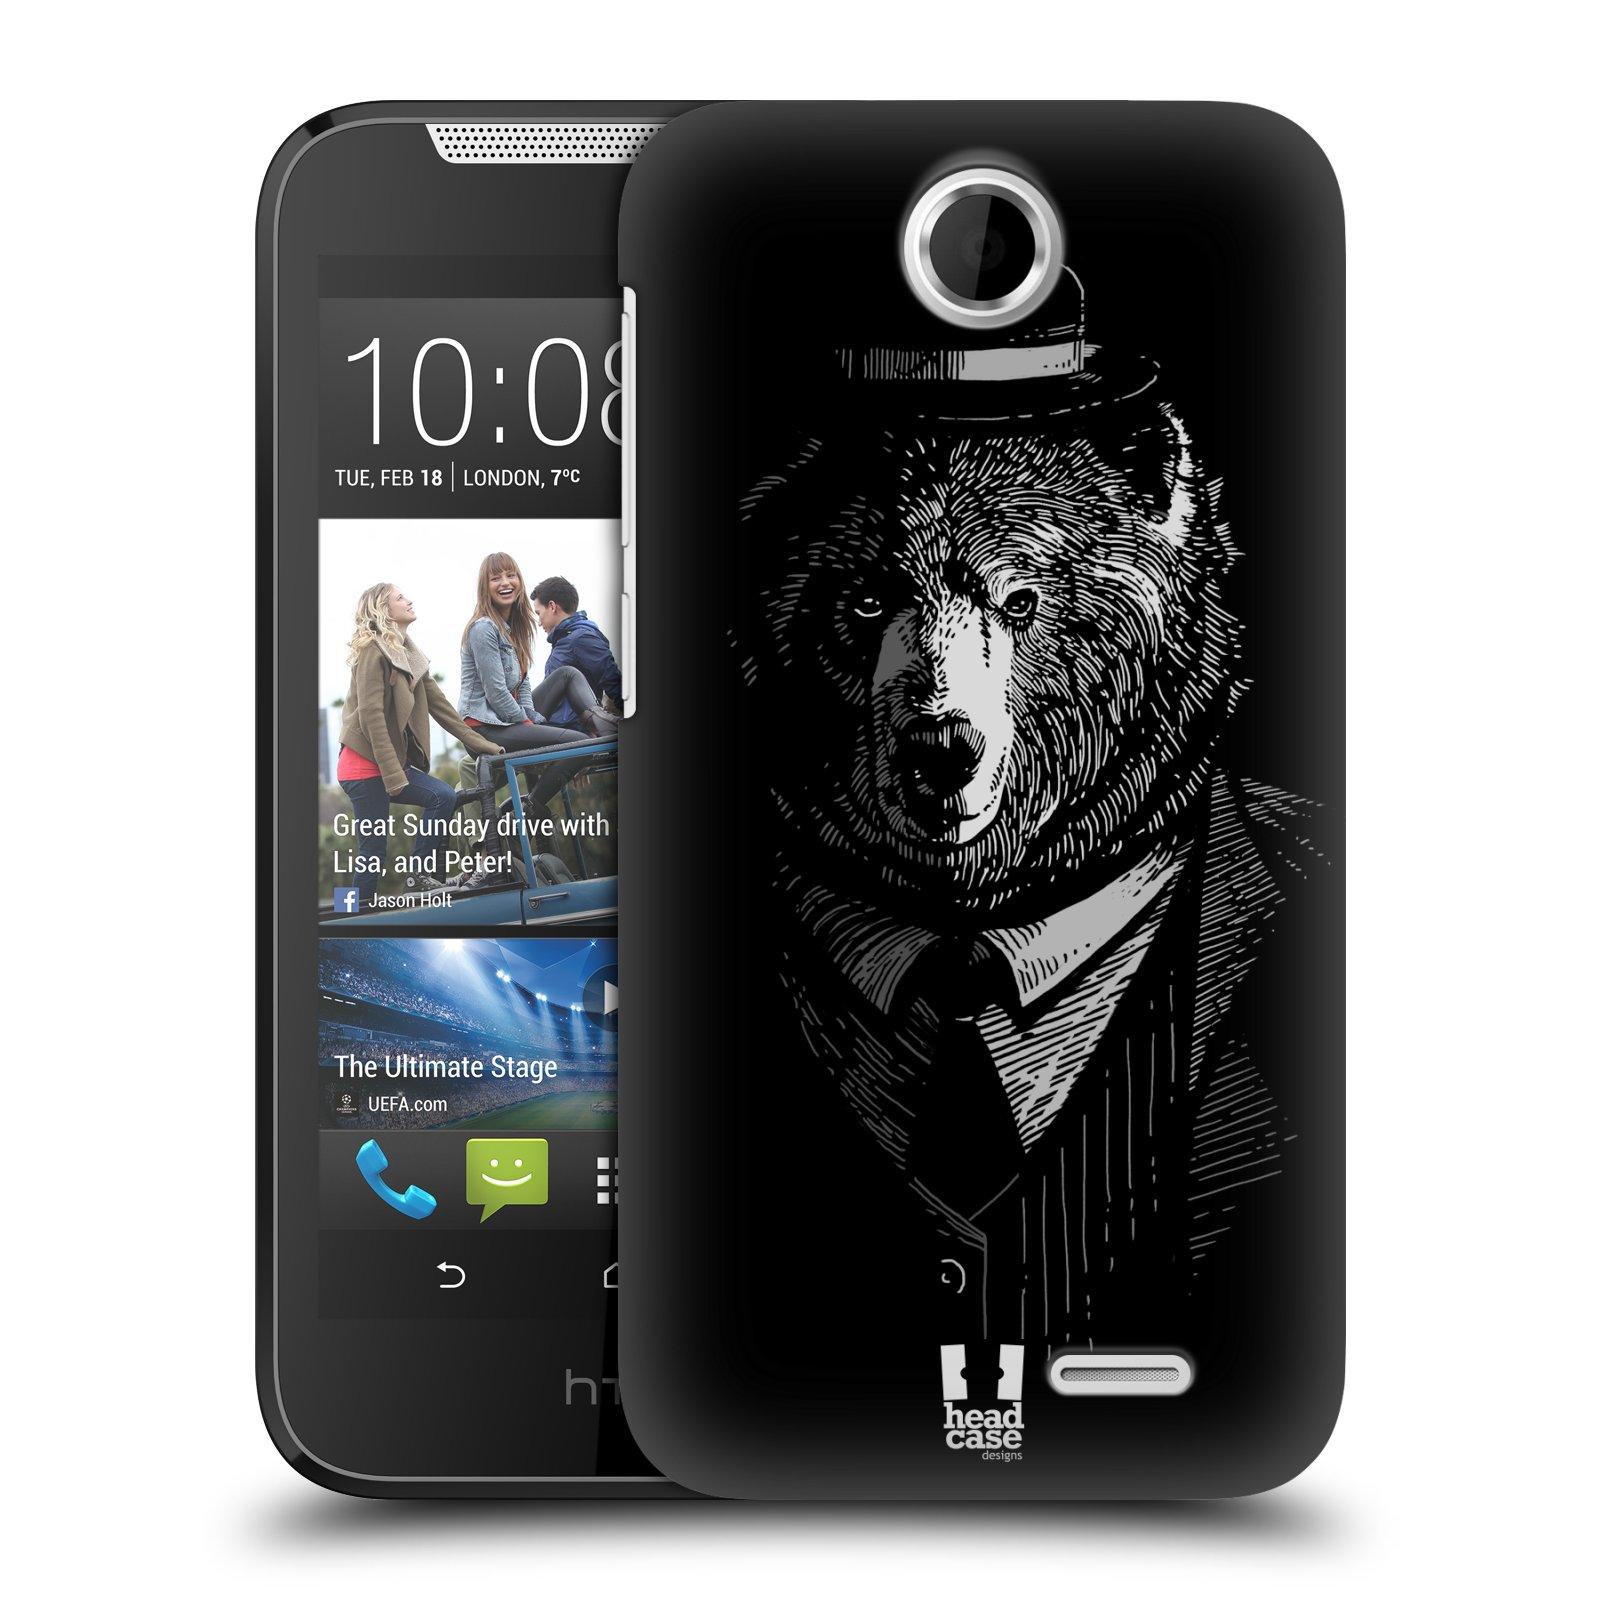 HEAD CASE plastový obal na mobil HTC Desire 310 vzor Zvíře v obleku medvěd